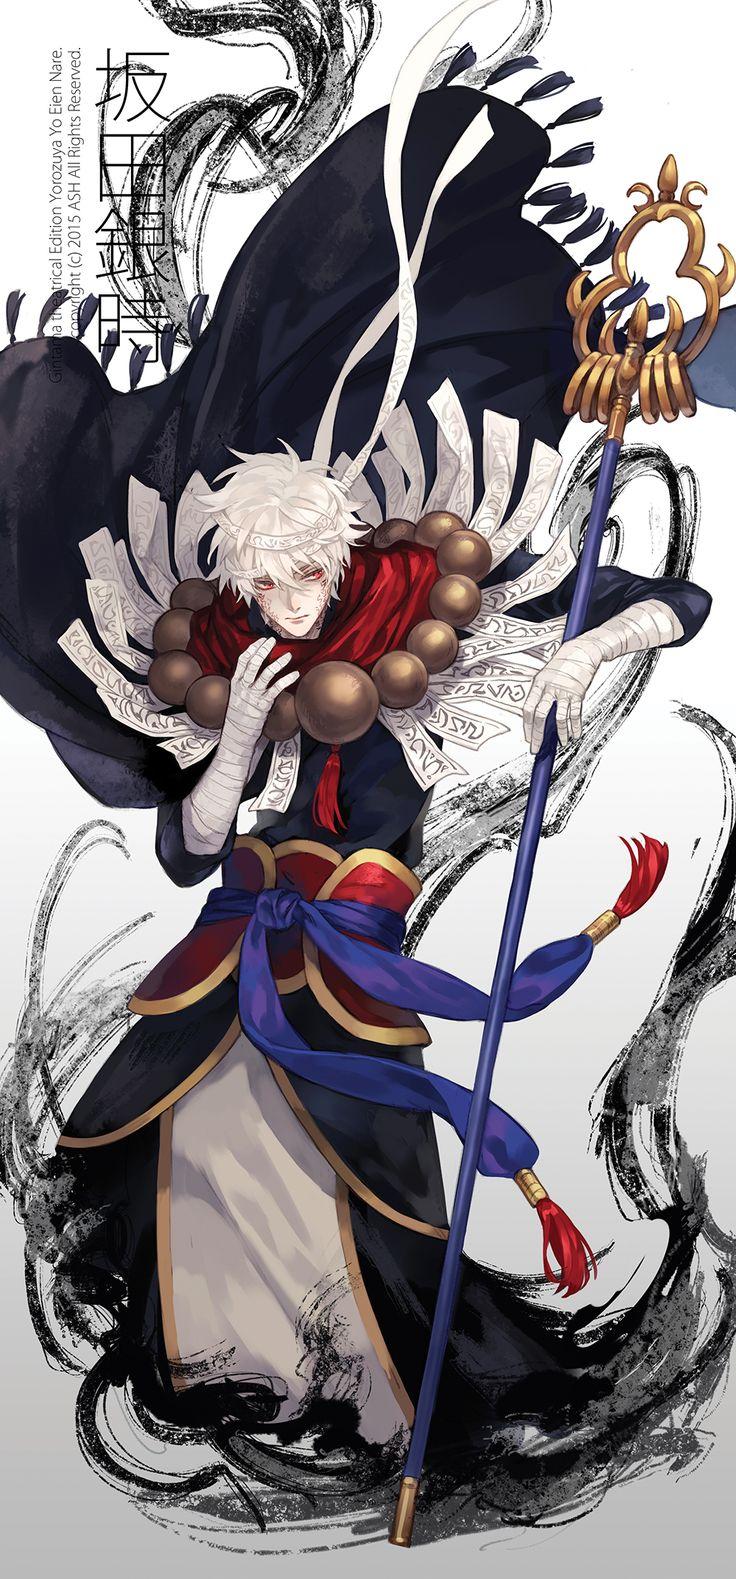 Gintama: Sakata Gintoki, Pixiv ID 2074024